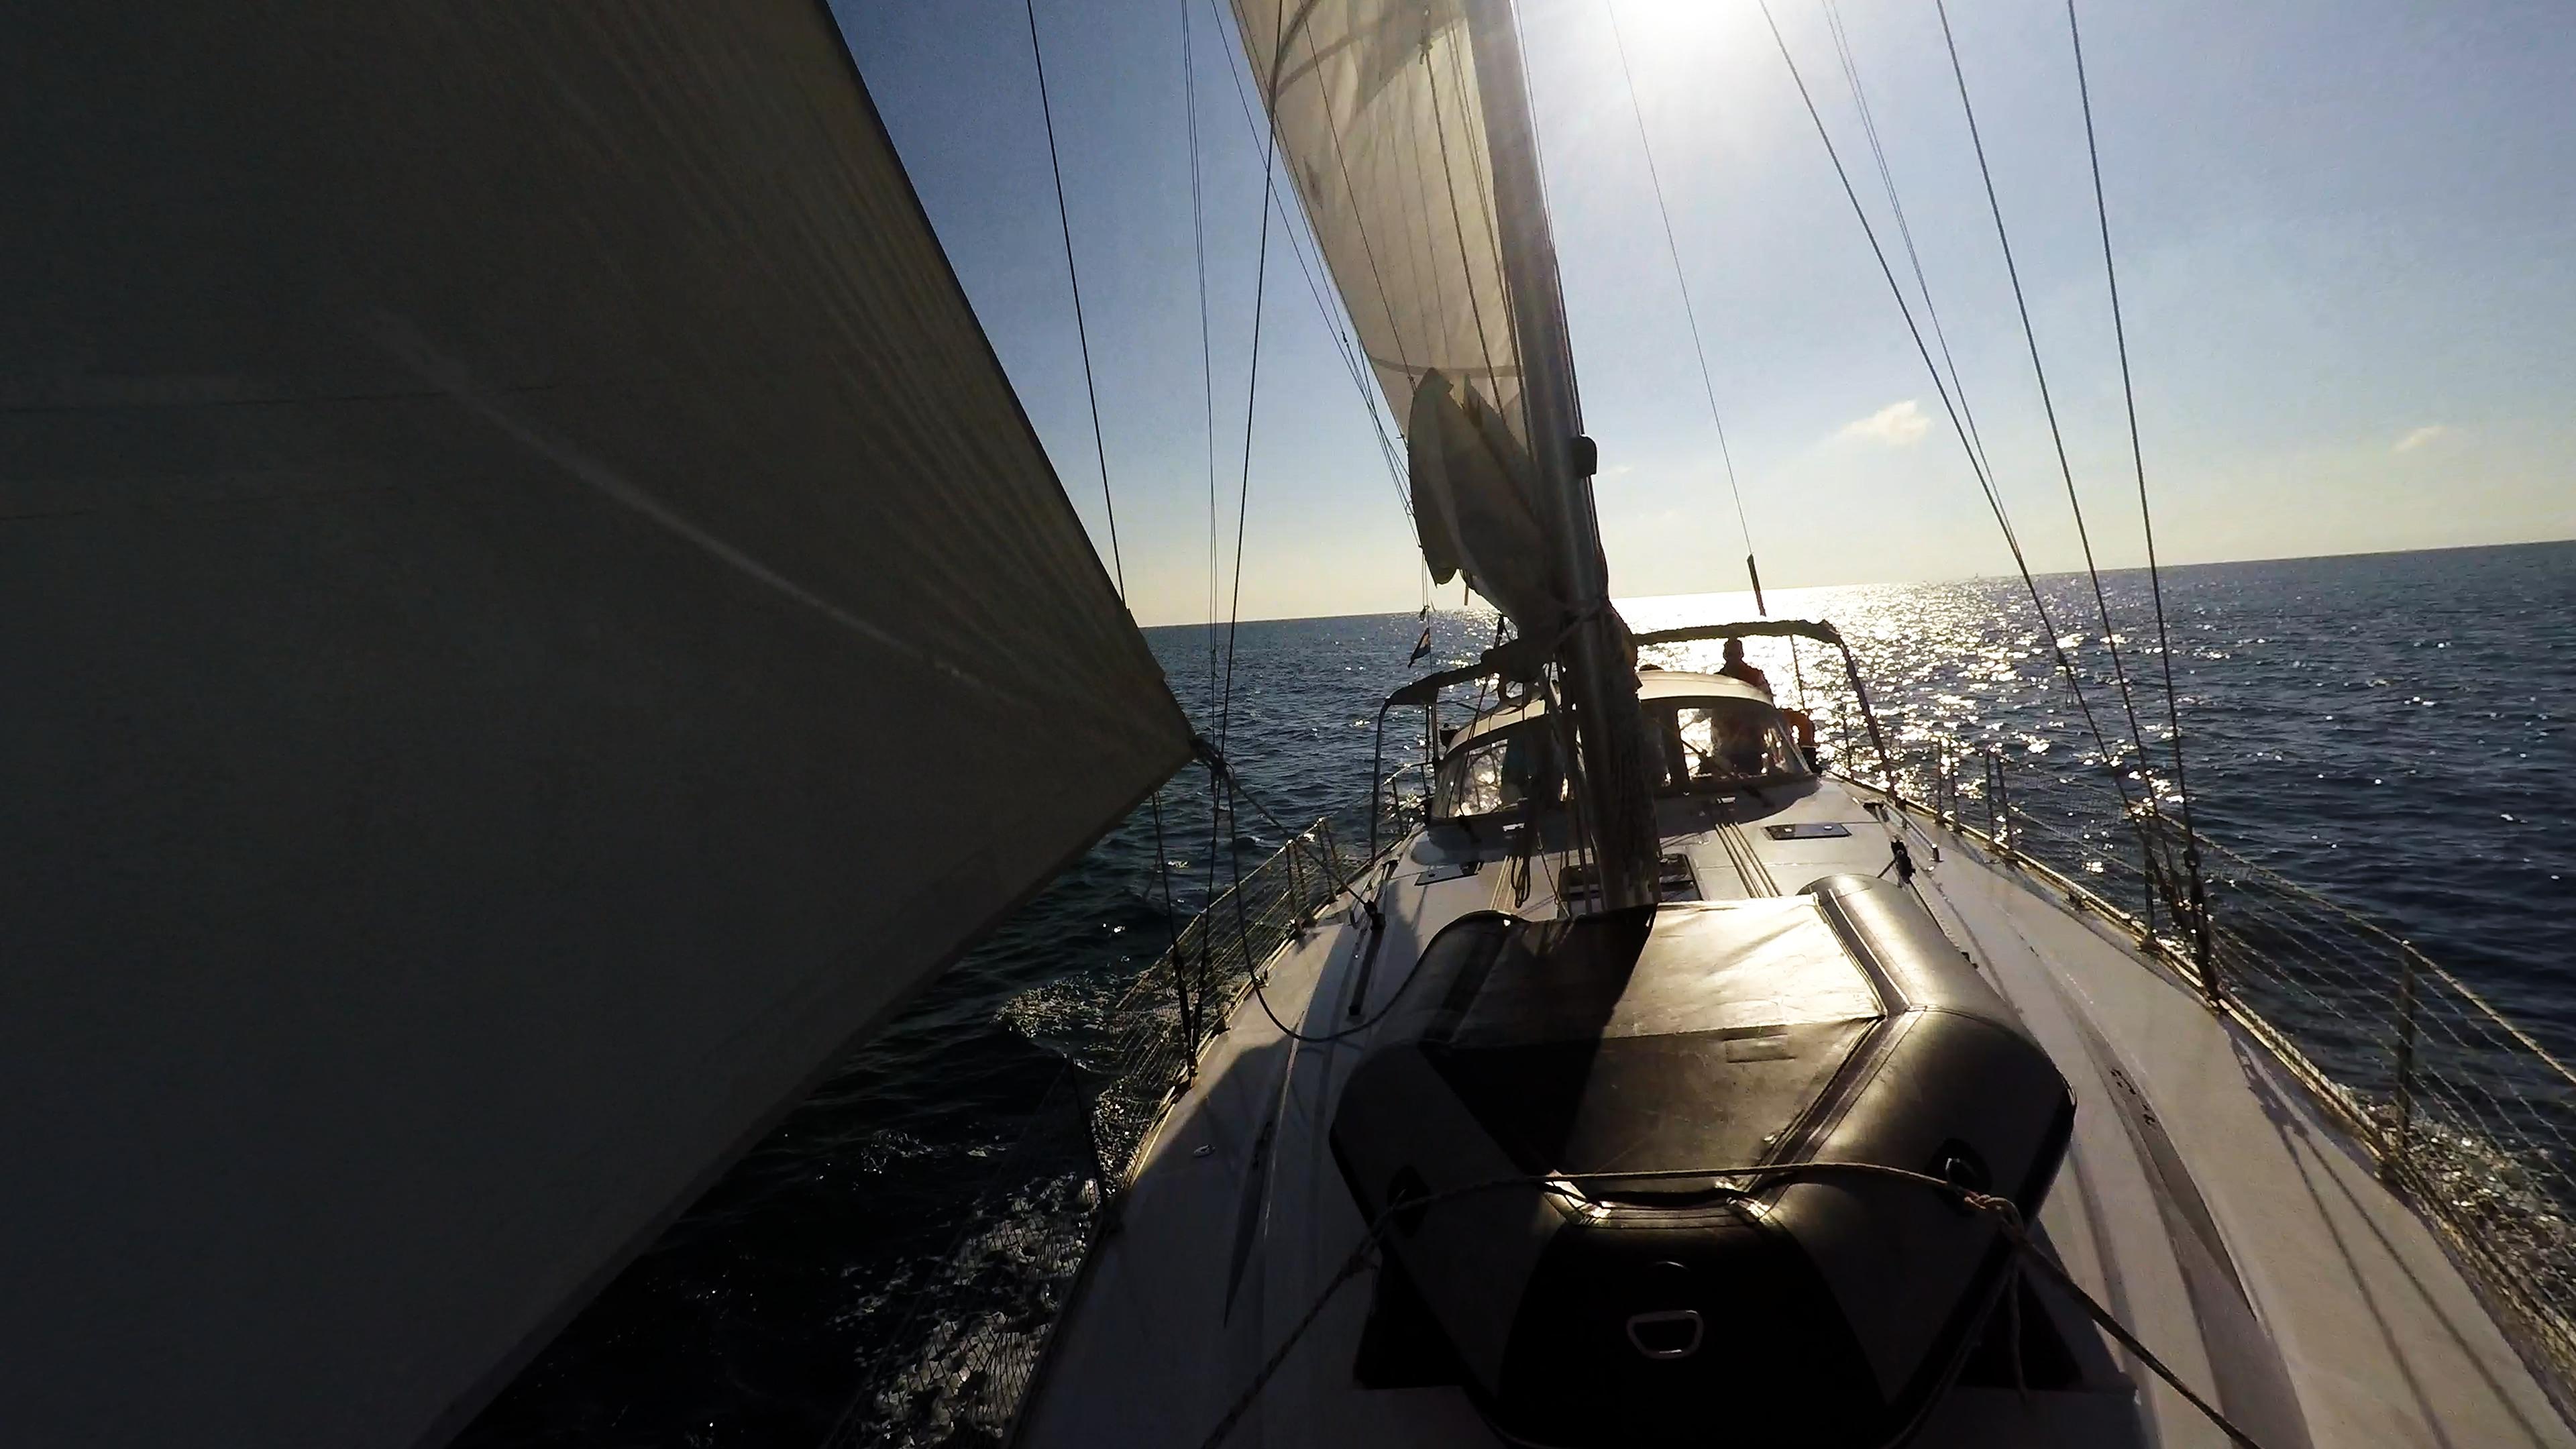 barcha a vela bavaria 46 gommone al ponte yacht a vela sole vele genova